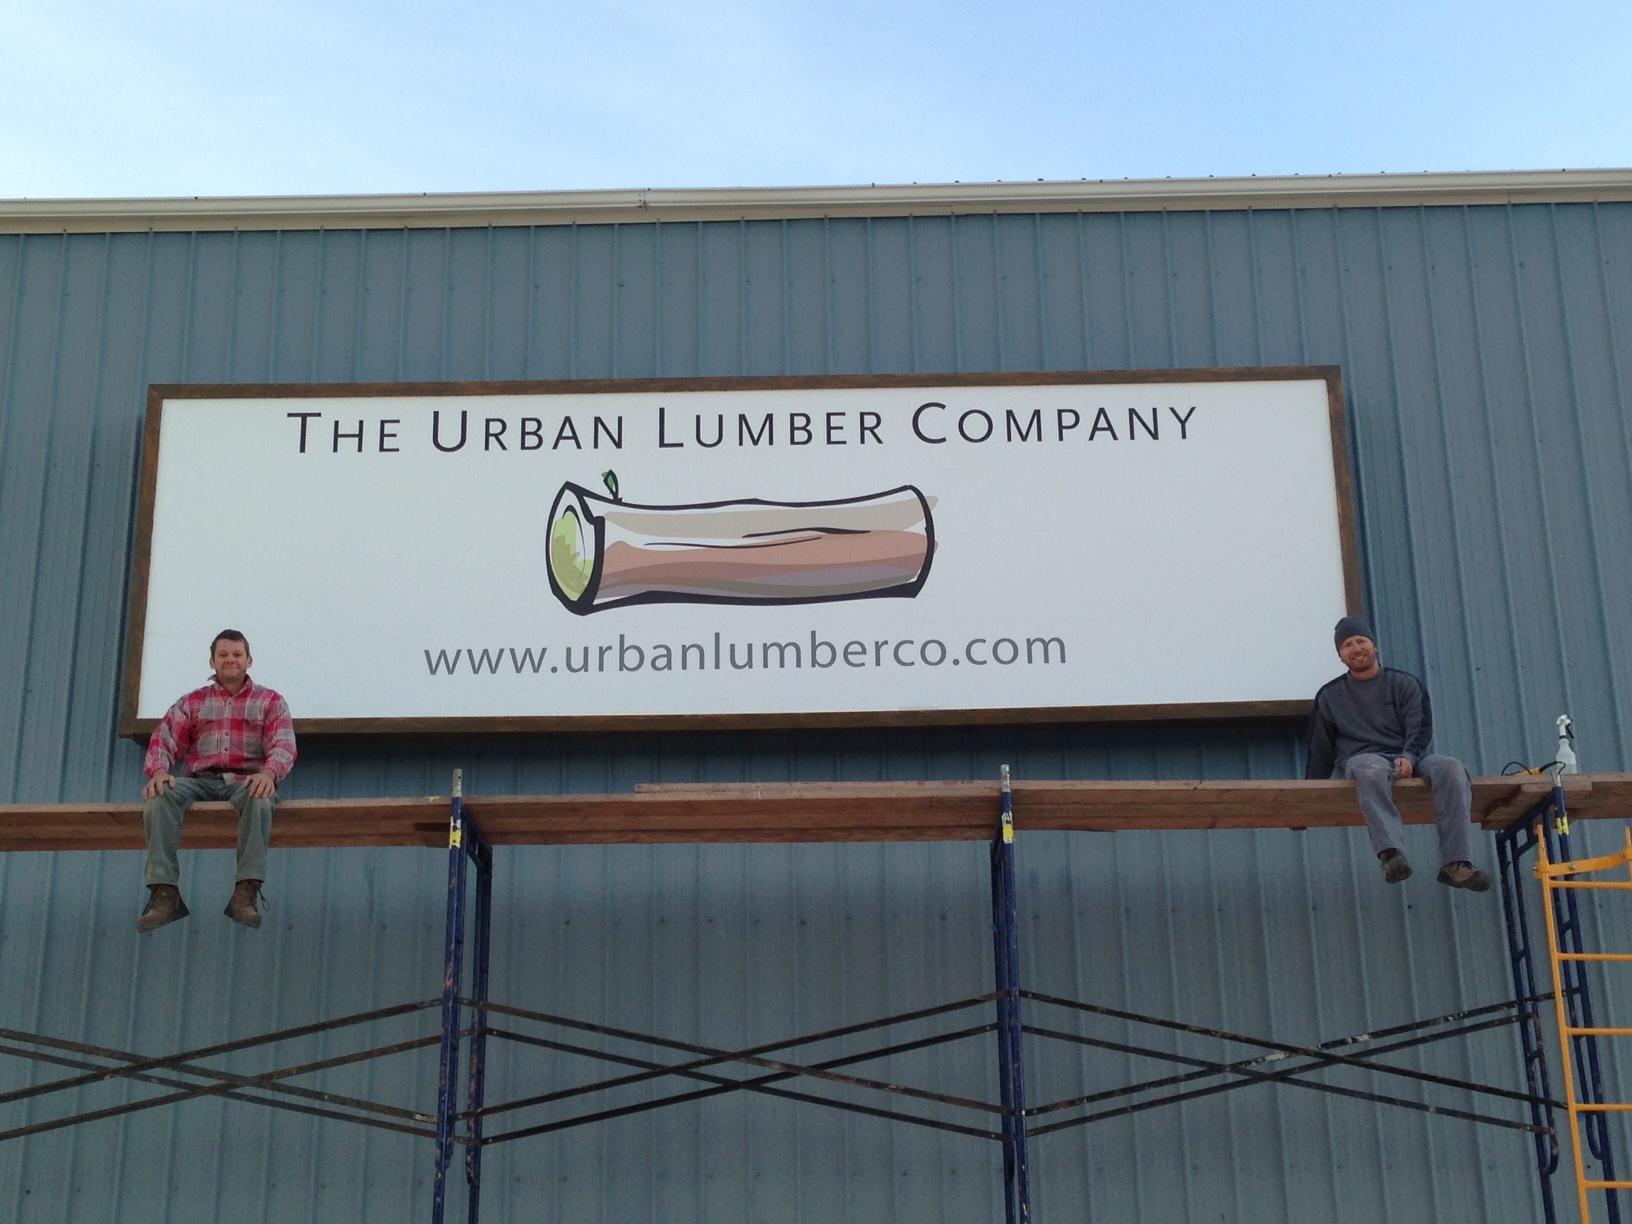 urbanlumberco-about.jpg